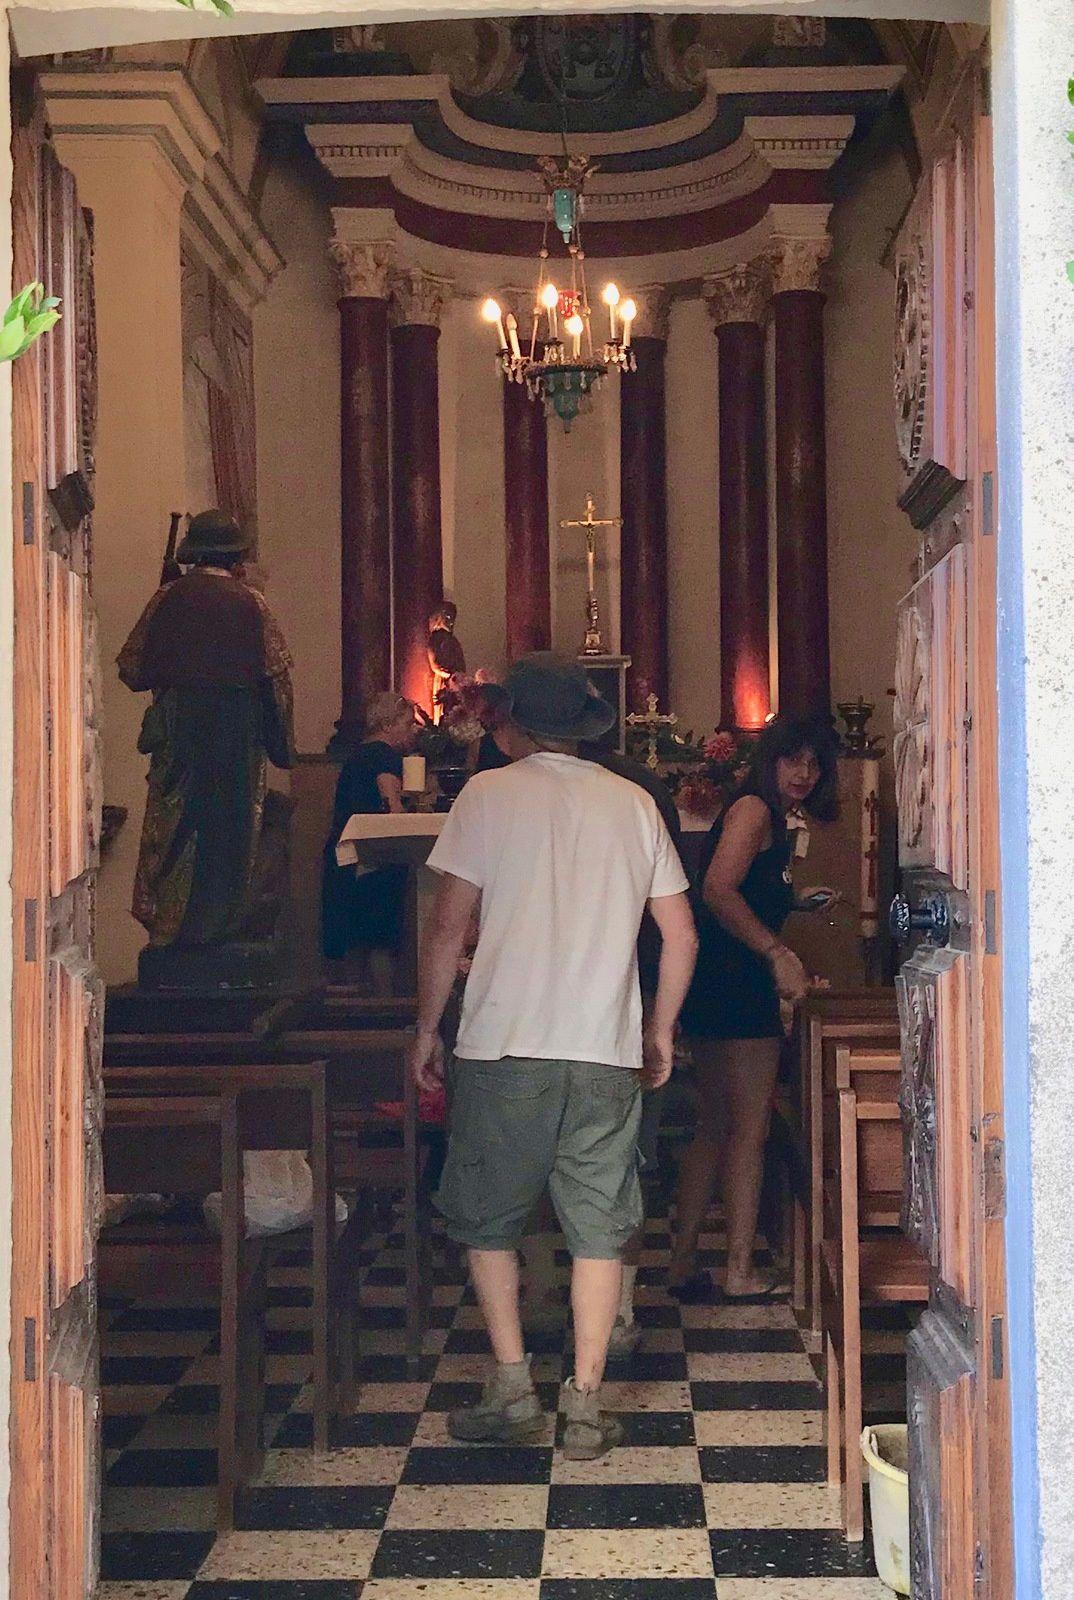 Toujours vivante, la tradition de Saint Roch